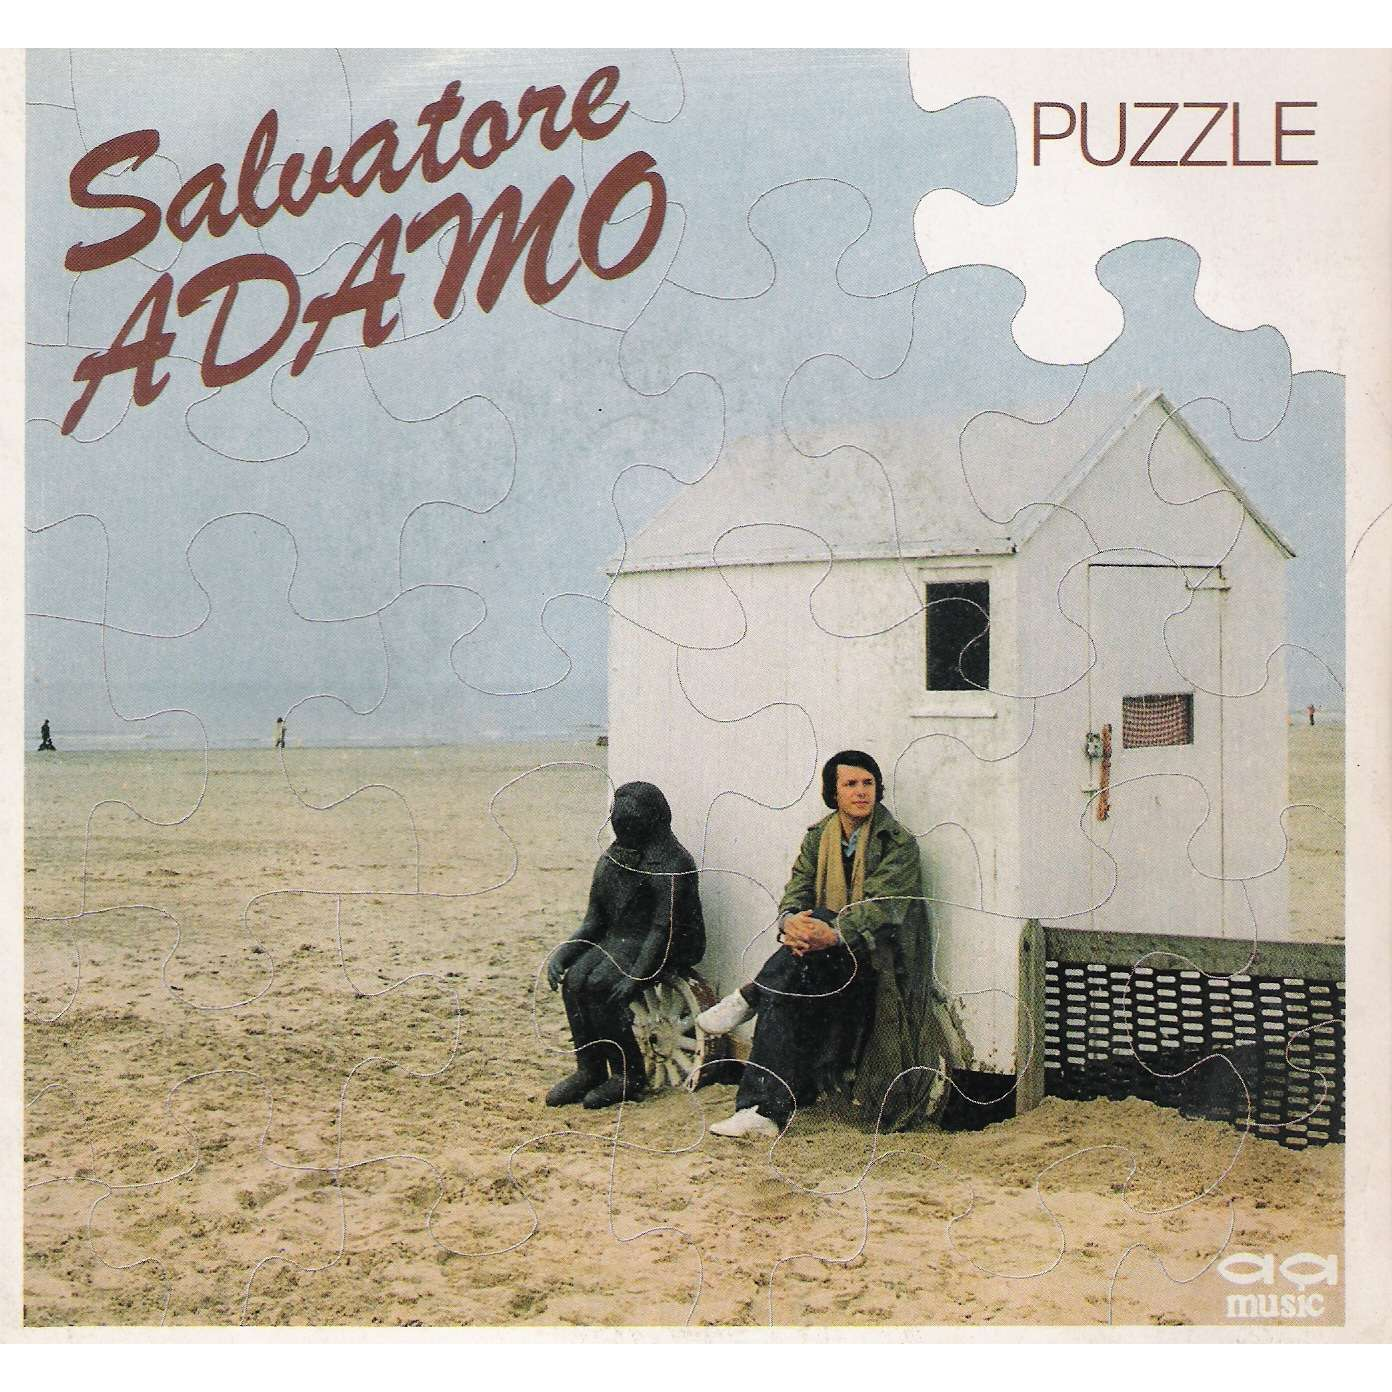 Puzzle By Adamo Salvatore Sp With Ninondisque Ref